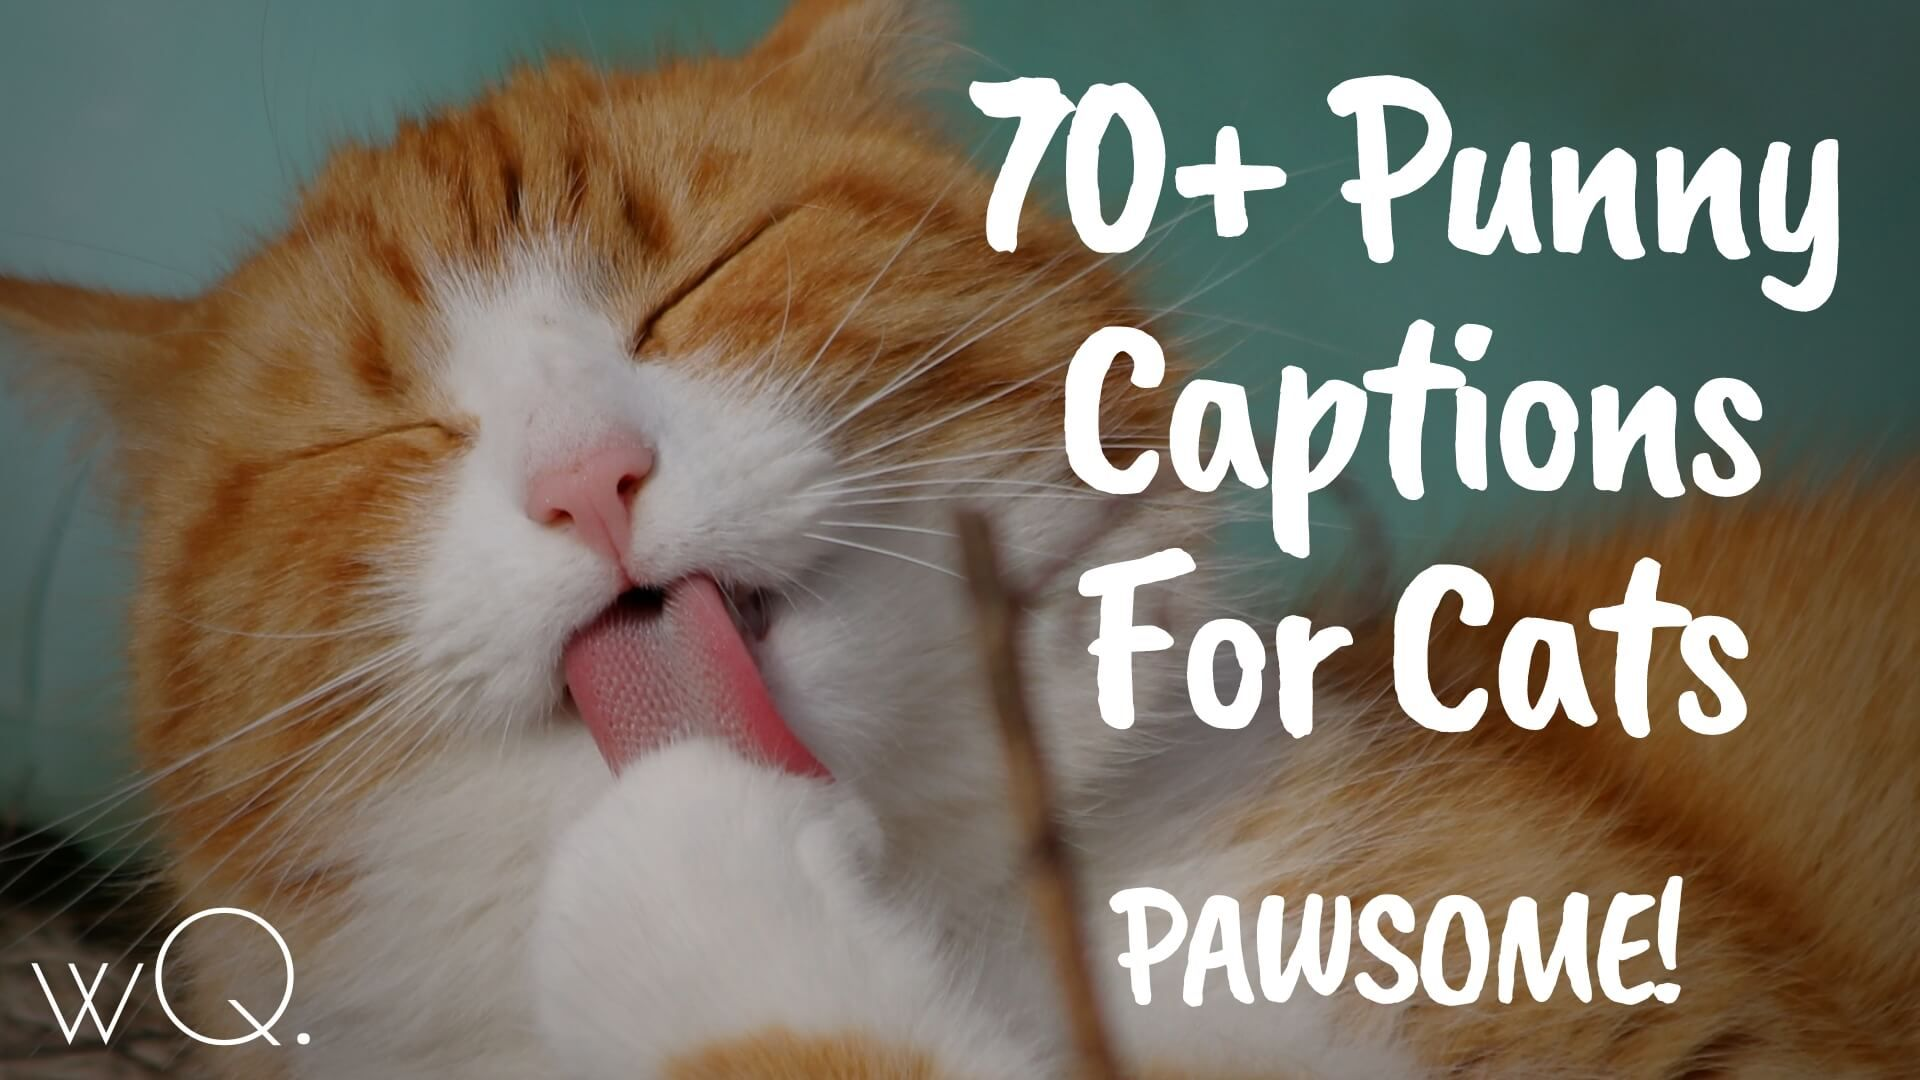 70 Punny Captions For Cats Pawsome Instagram Pictures Wittyquest Funny Cat Captions Funny Instagram Captions Cat Captions